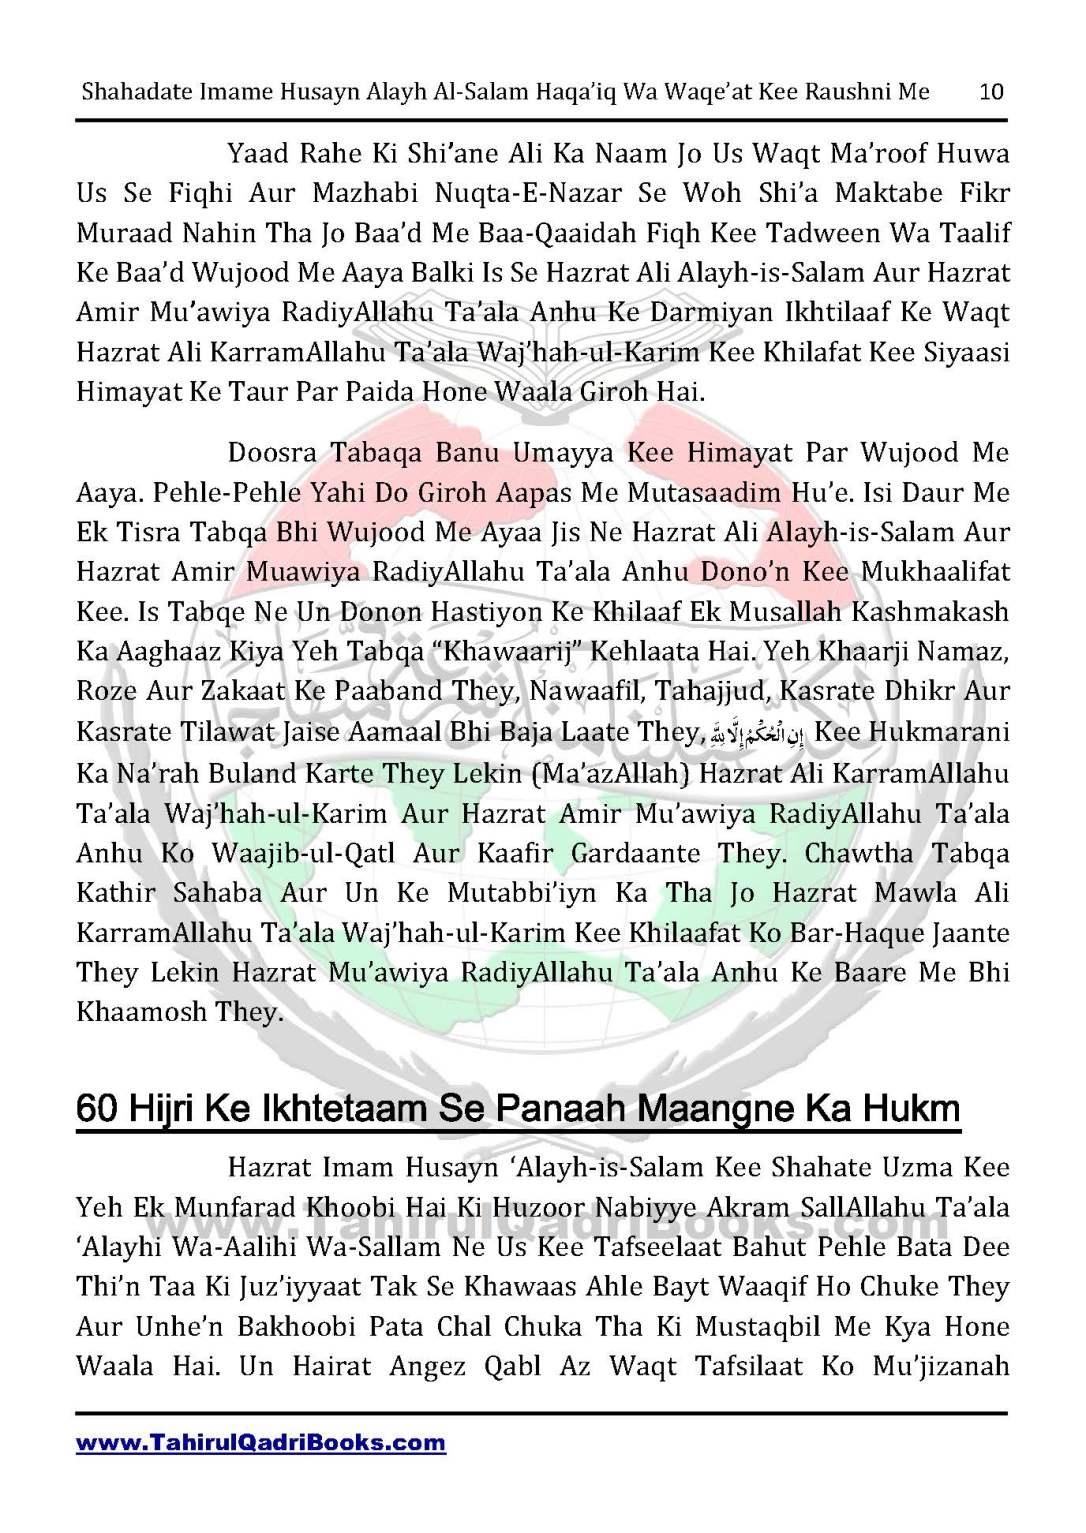 shahadate-imame-husayn-alayh-is-salam-haqaiq-wa-waqe_at-kee-raushni-me-in-roman-urdu-unlocked_Page_10